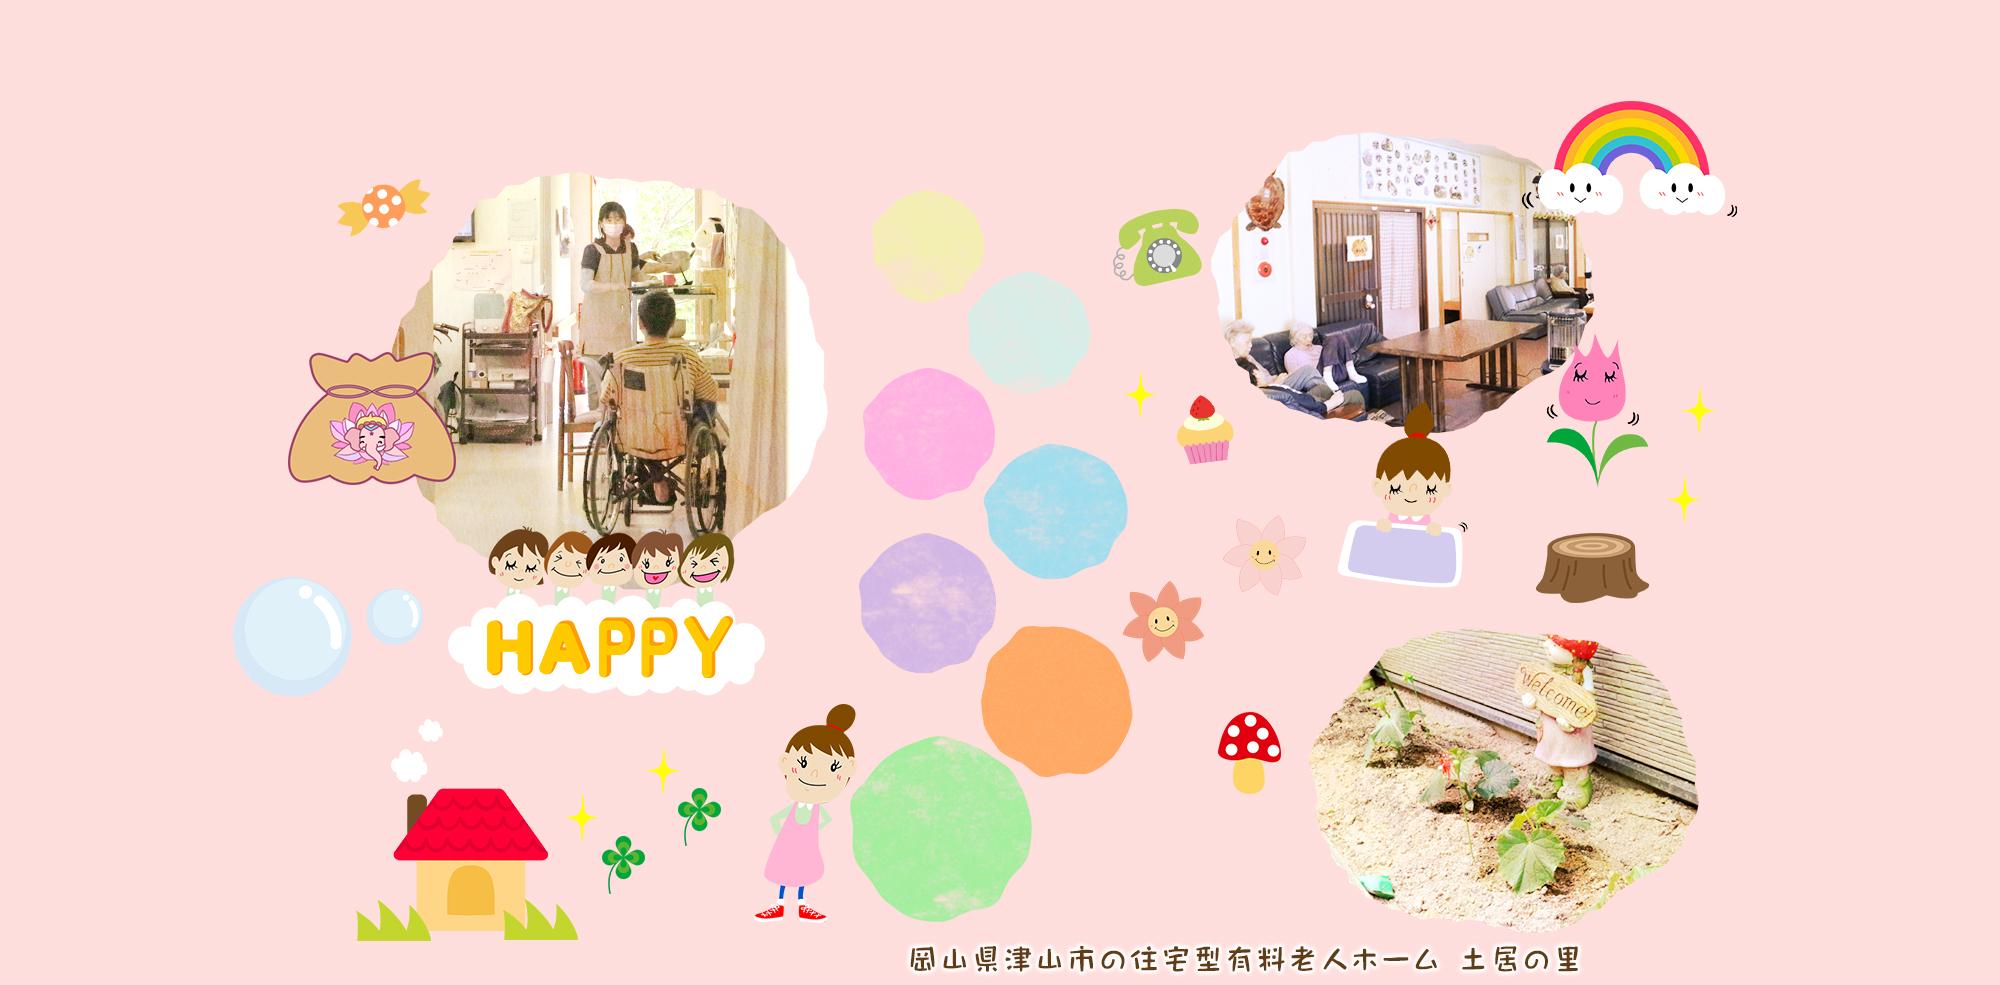 岡山県津山市の住宅型有料老人ホーム 土居の里